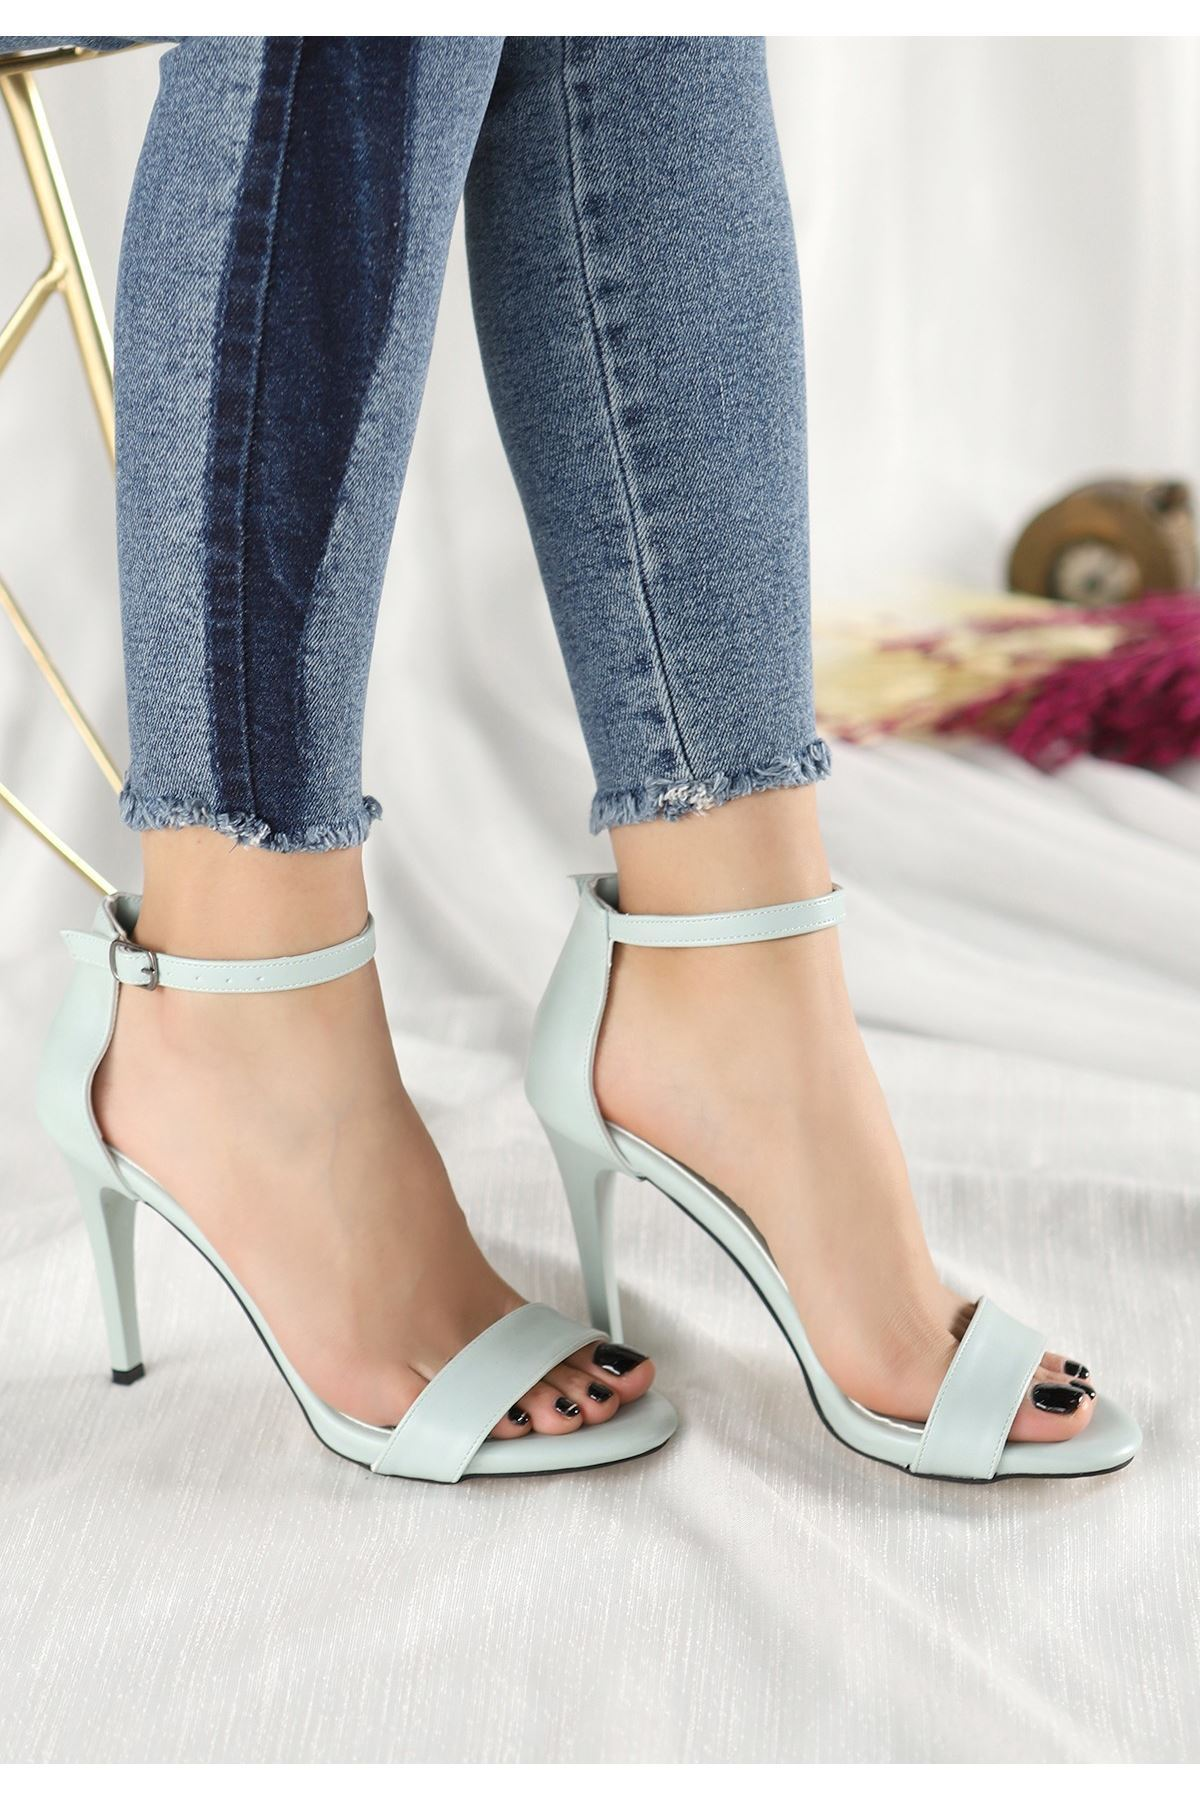 Tima Su Yeşili Cilt Topuklu Ayakkabı